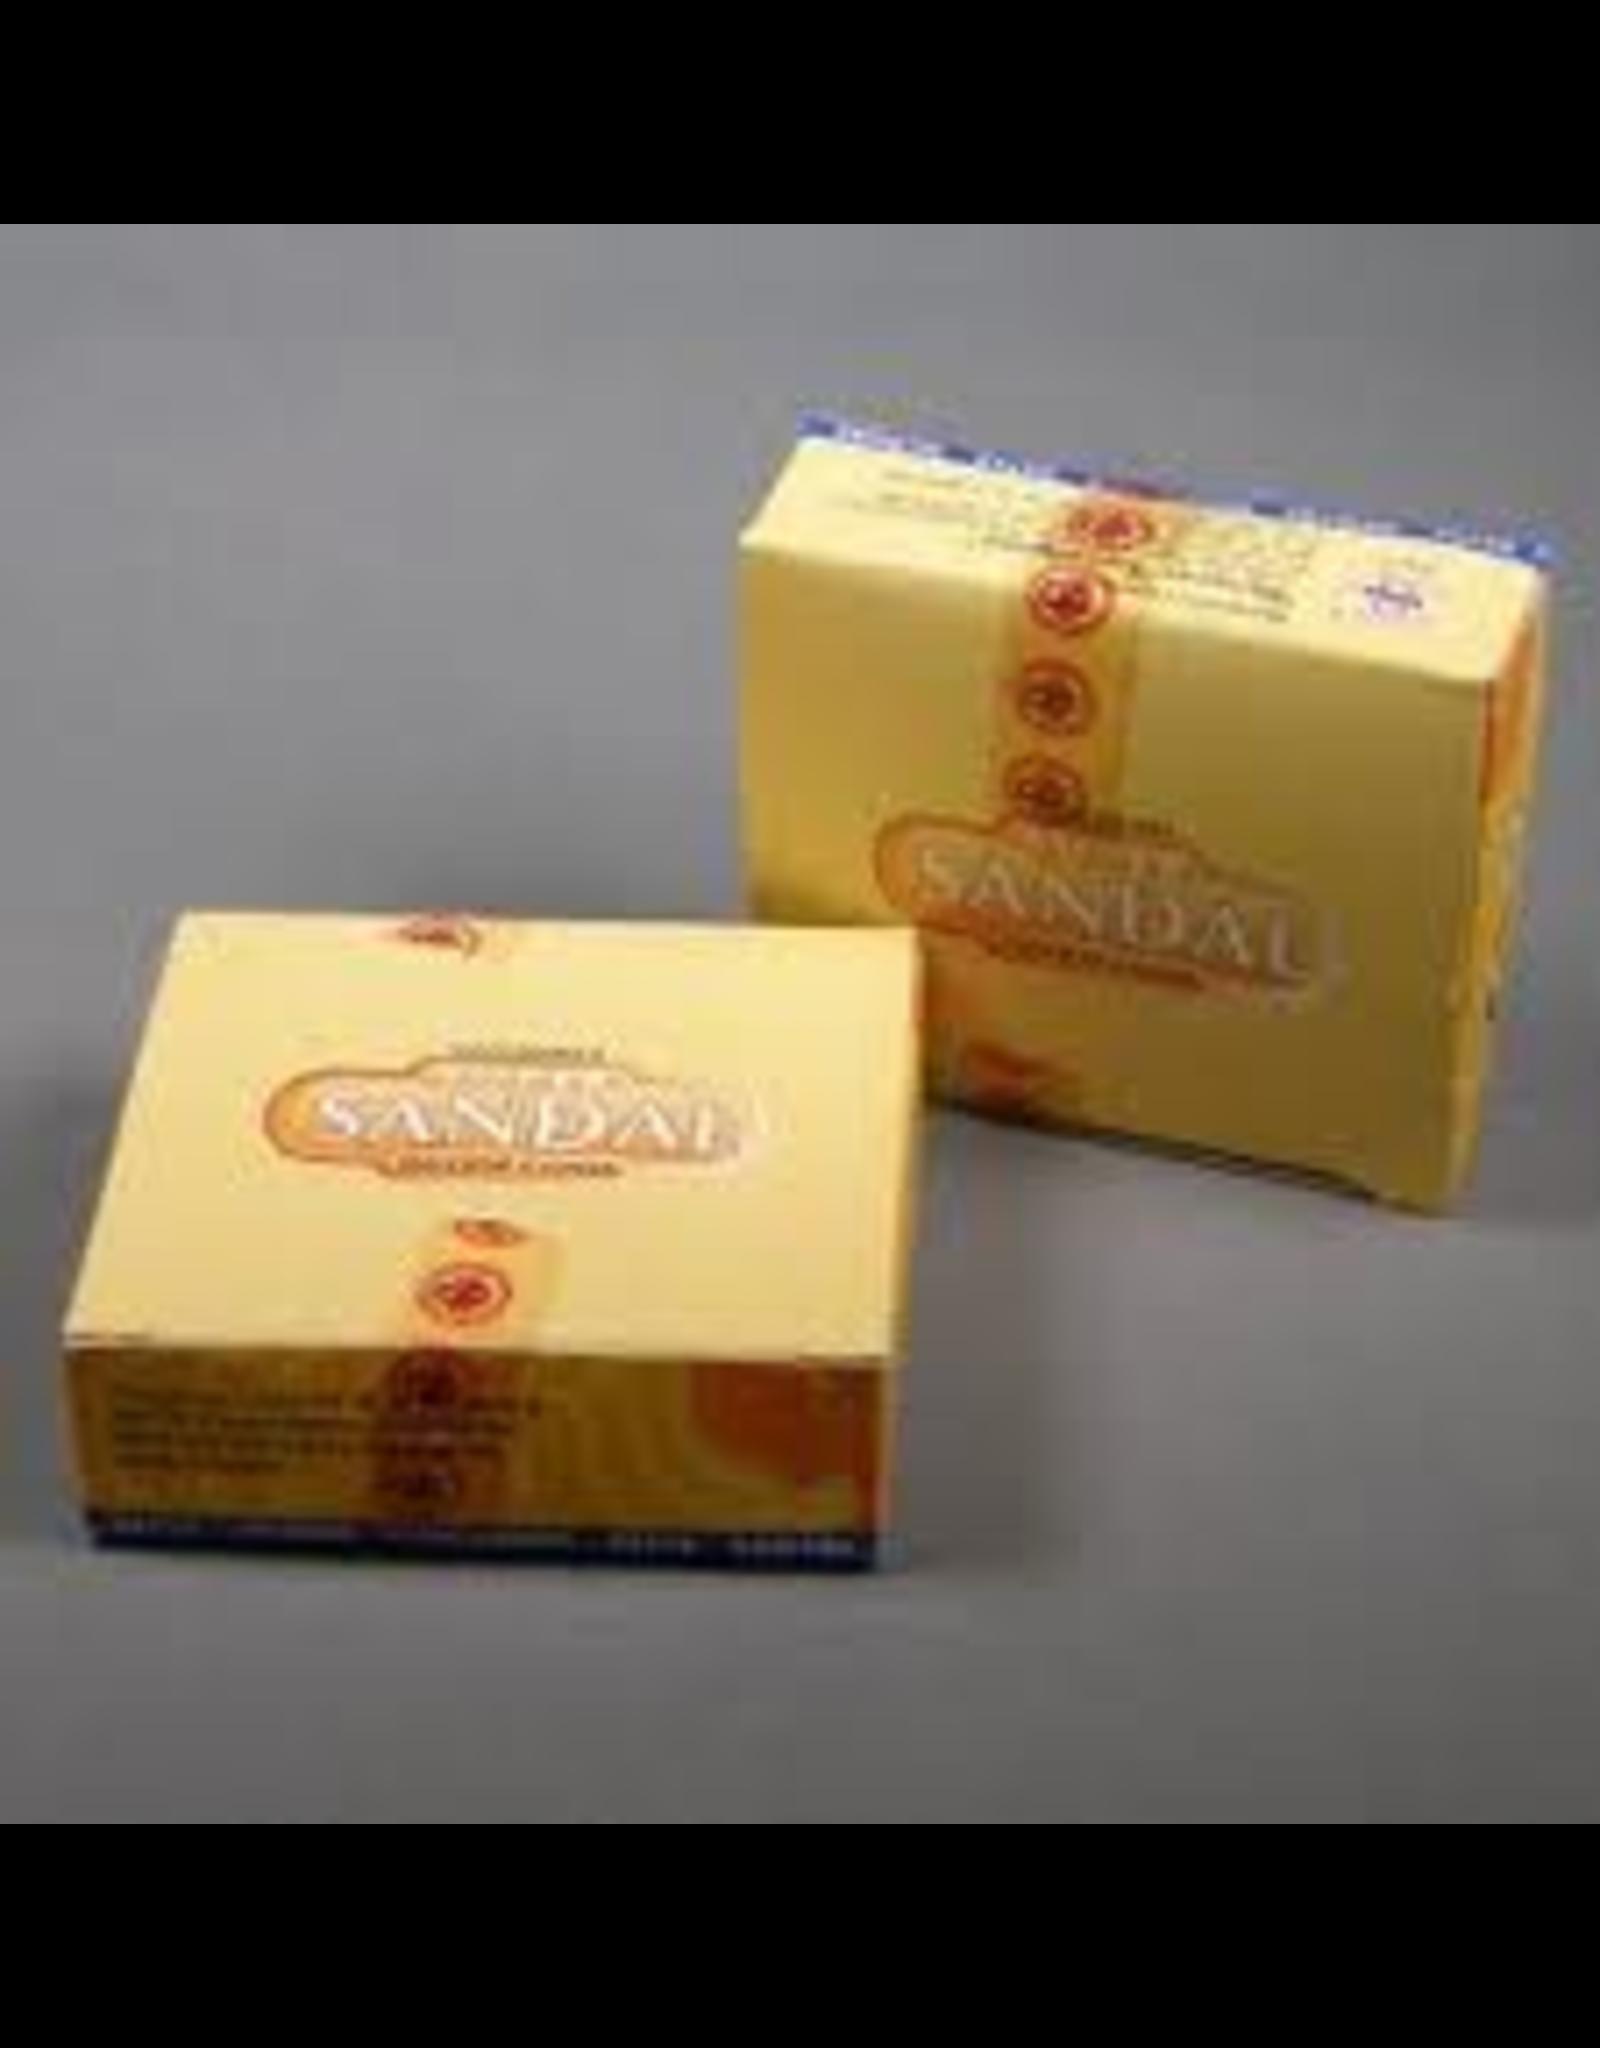 Satya Sandal Cone Incense